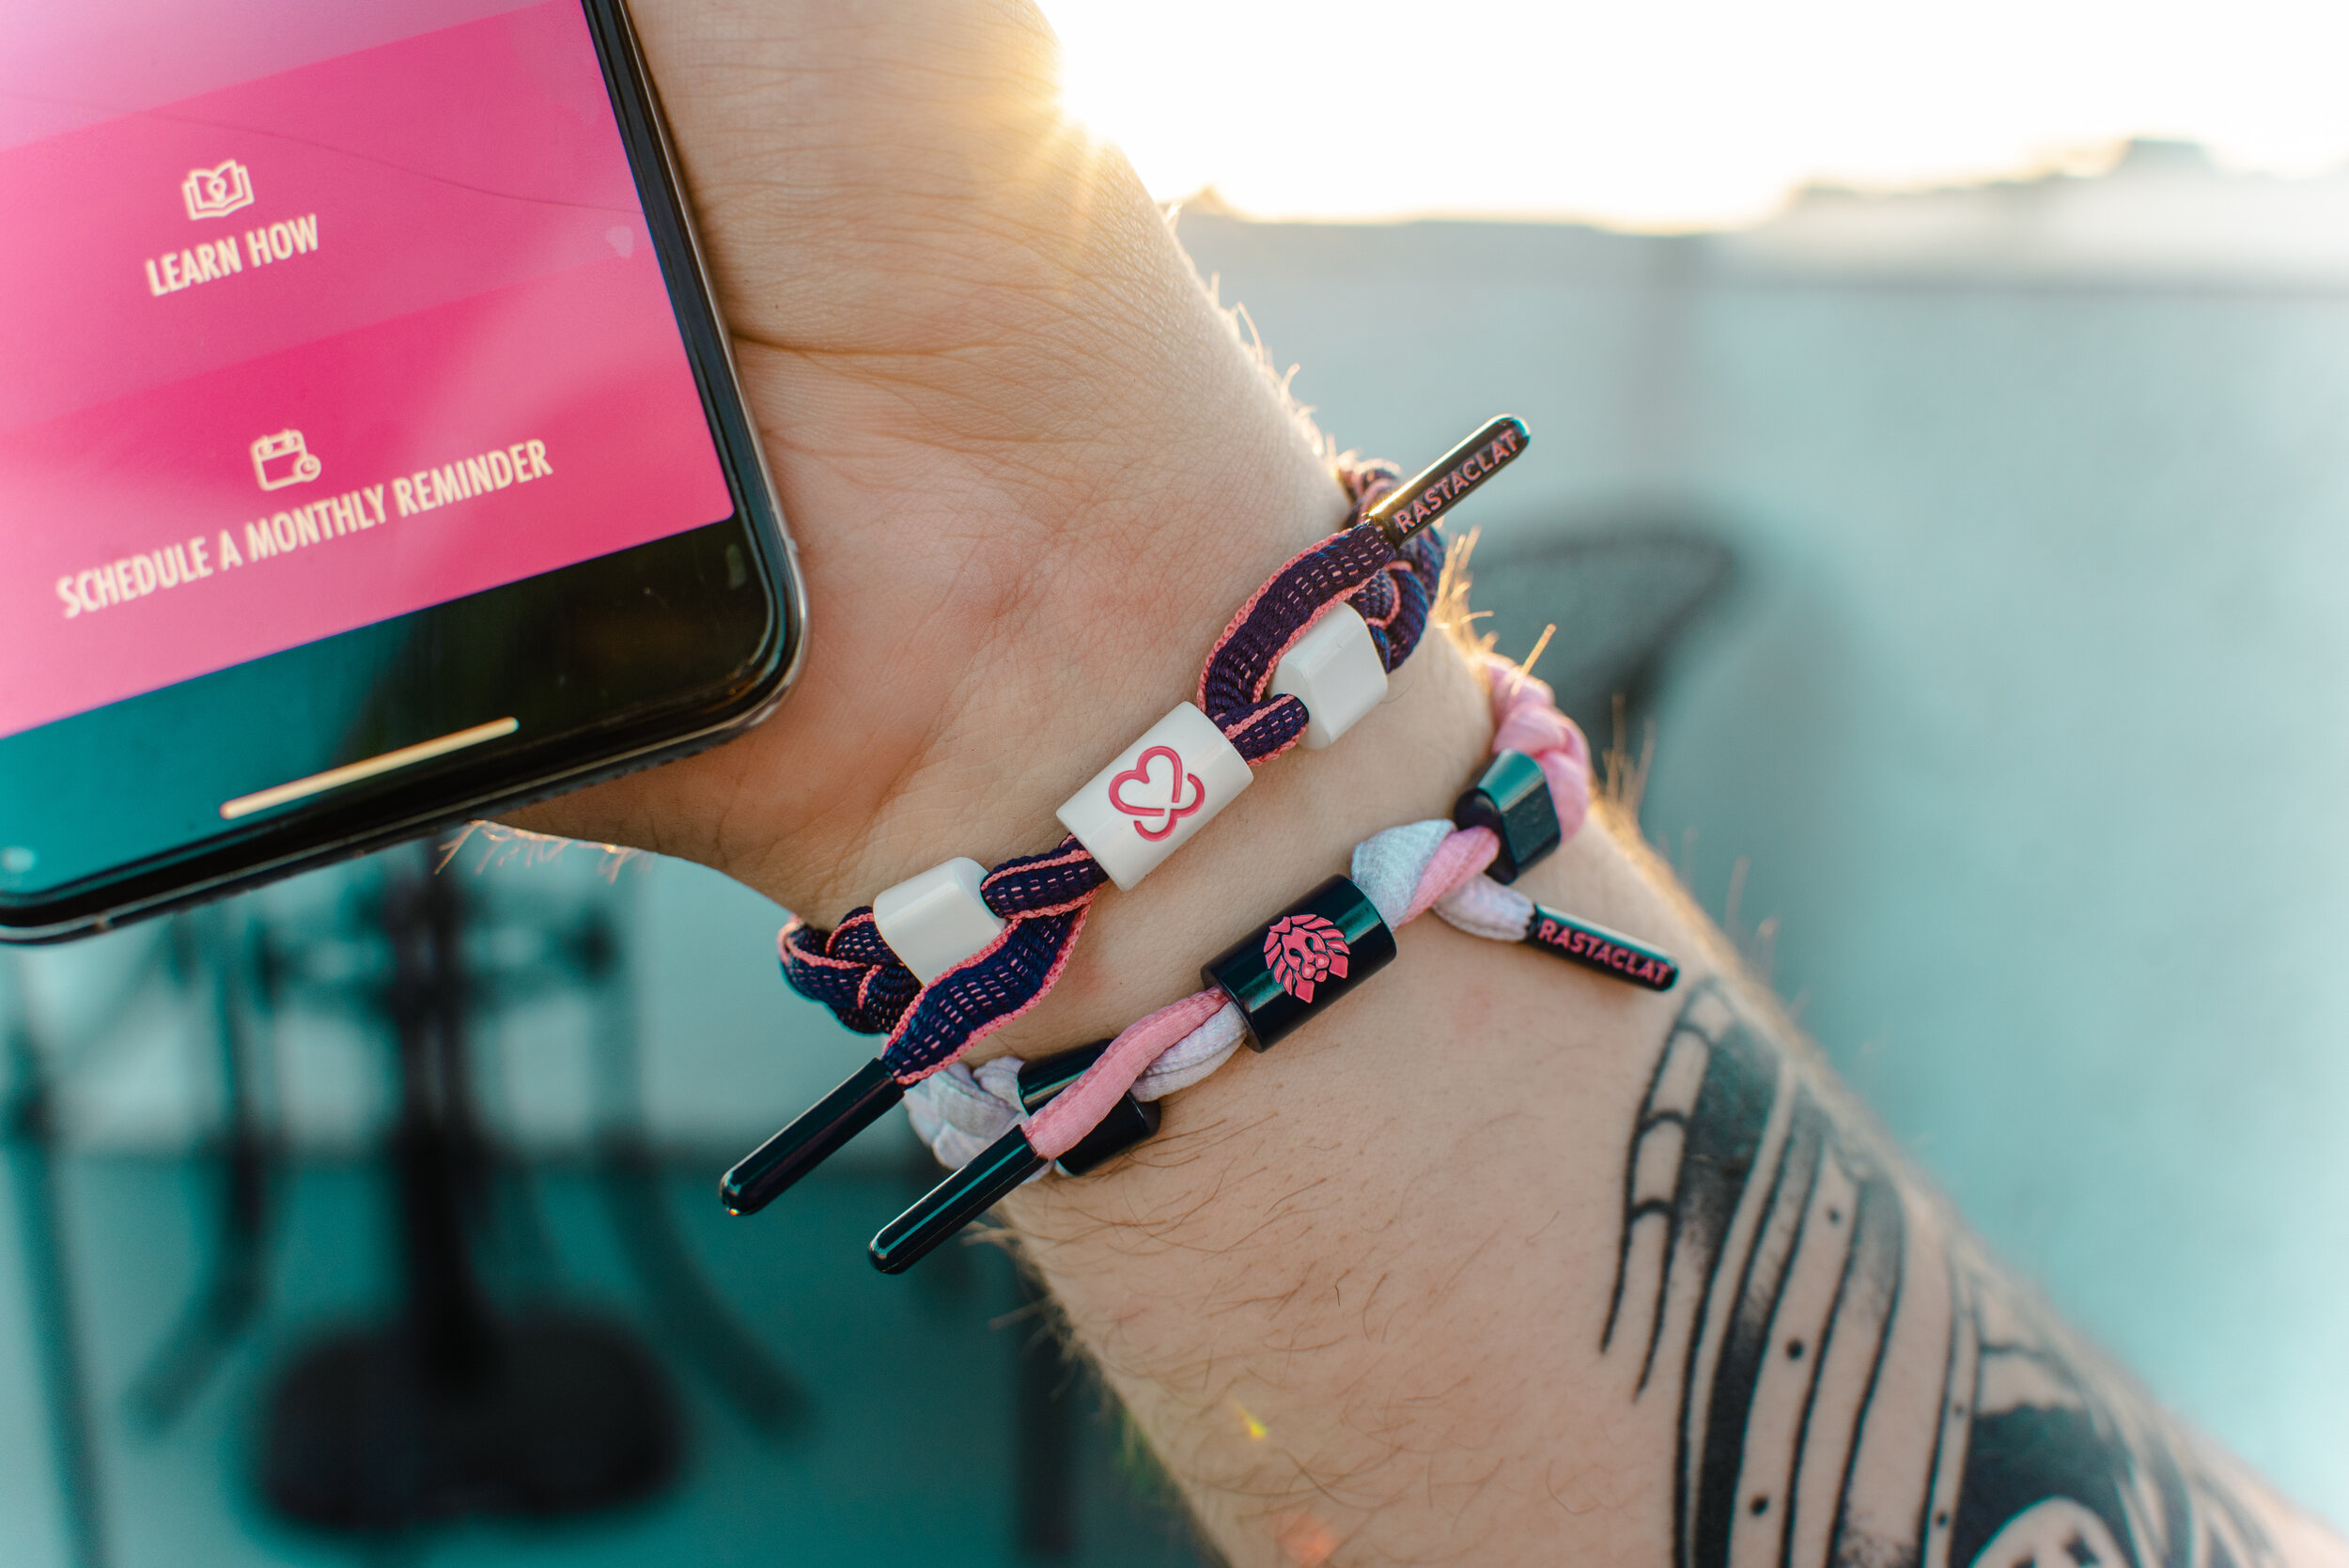 Rastaclat - $1 per Rastaclat x Keep A Breast collaboration bracelet sold benefits KAB!